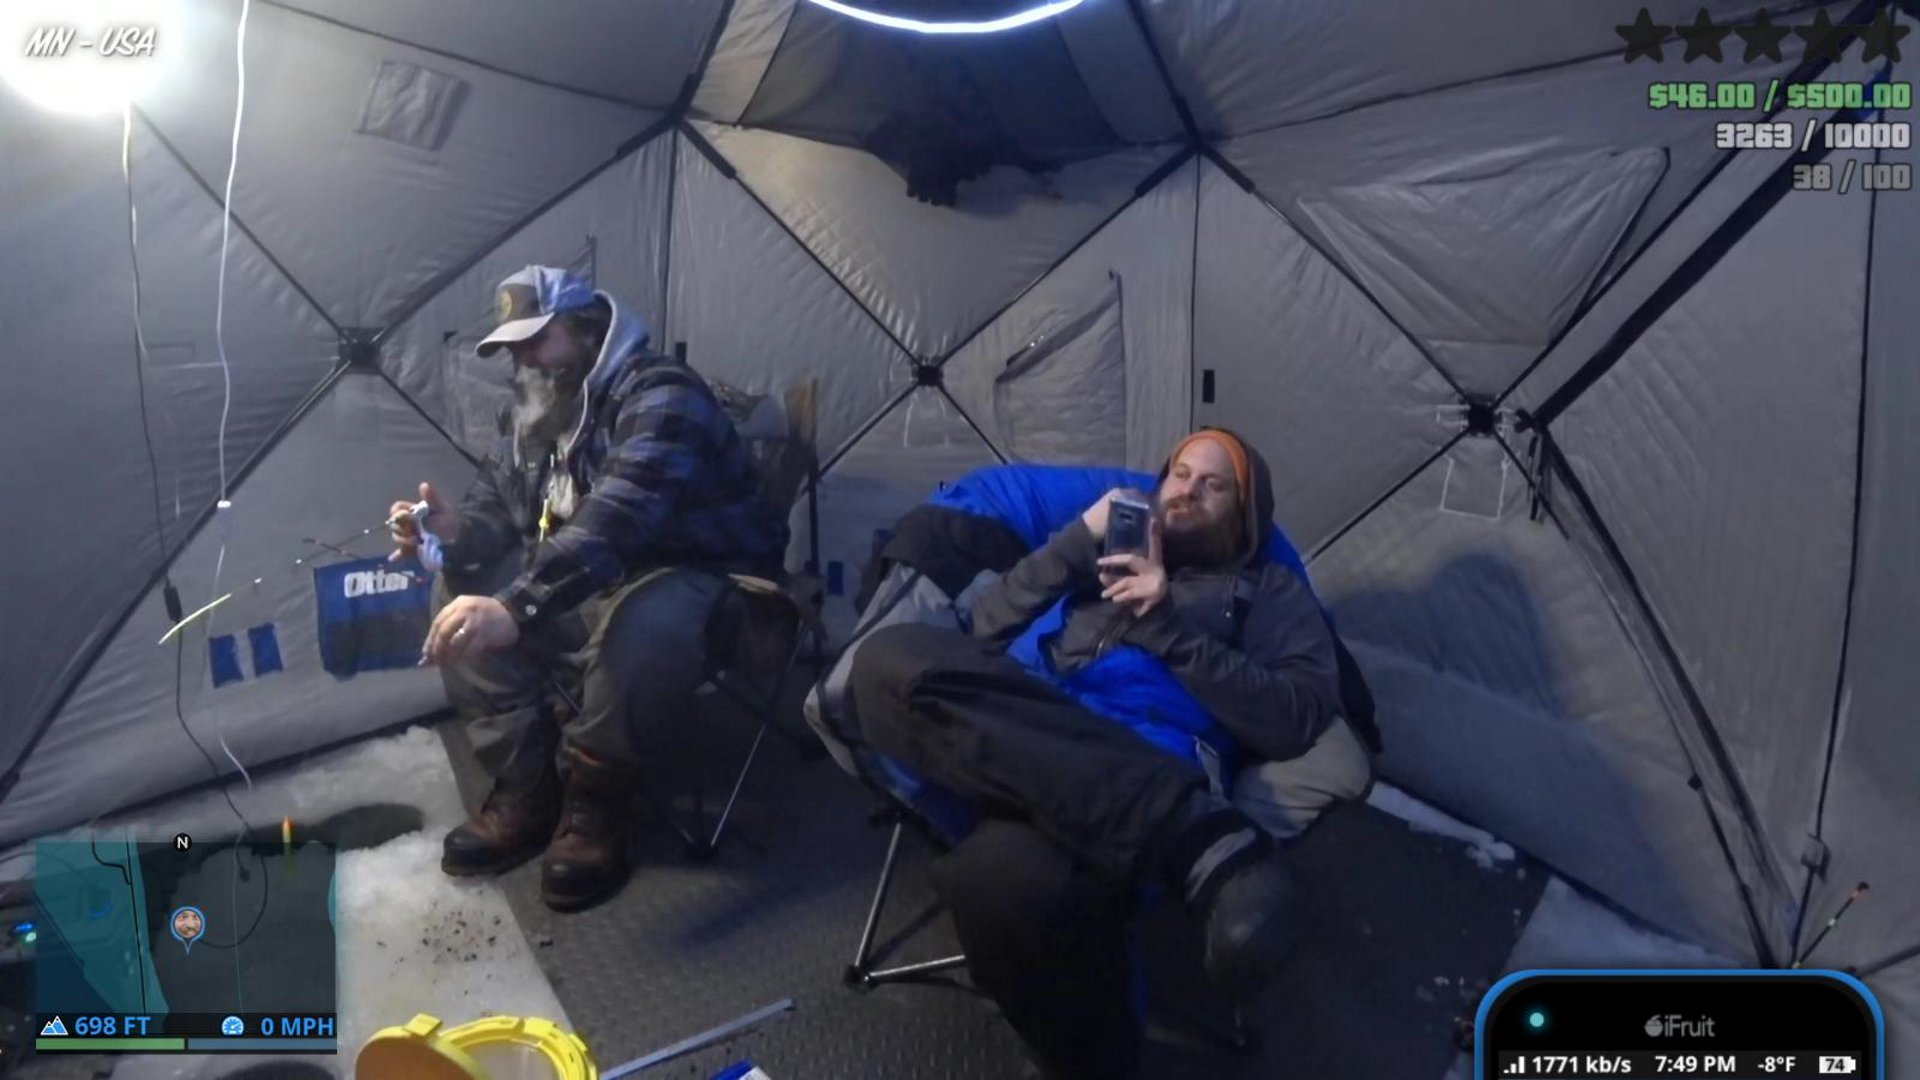 sturgeoncon-2021-live-on-the-st-croix-river-multi-just-chatting-0601-https-t-co-nix4ub3uca-https-t-co-siiihtj7hs